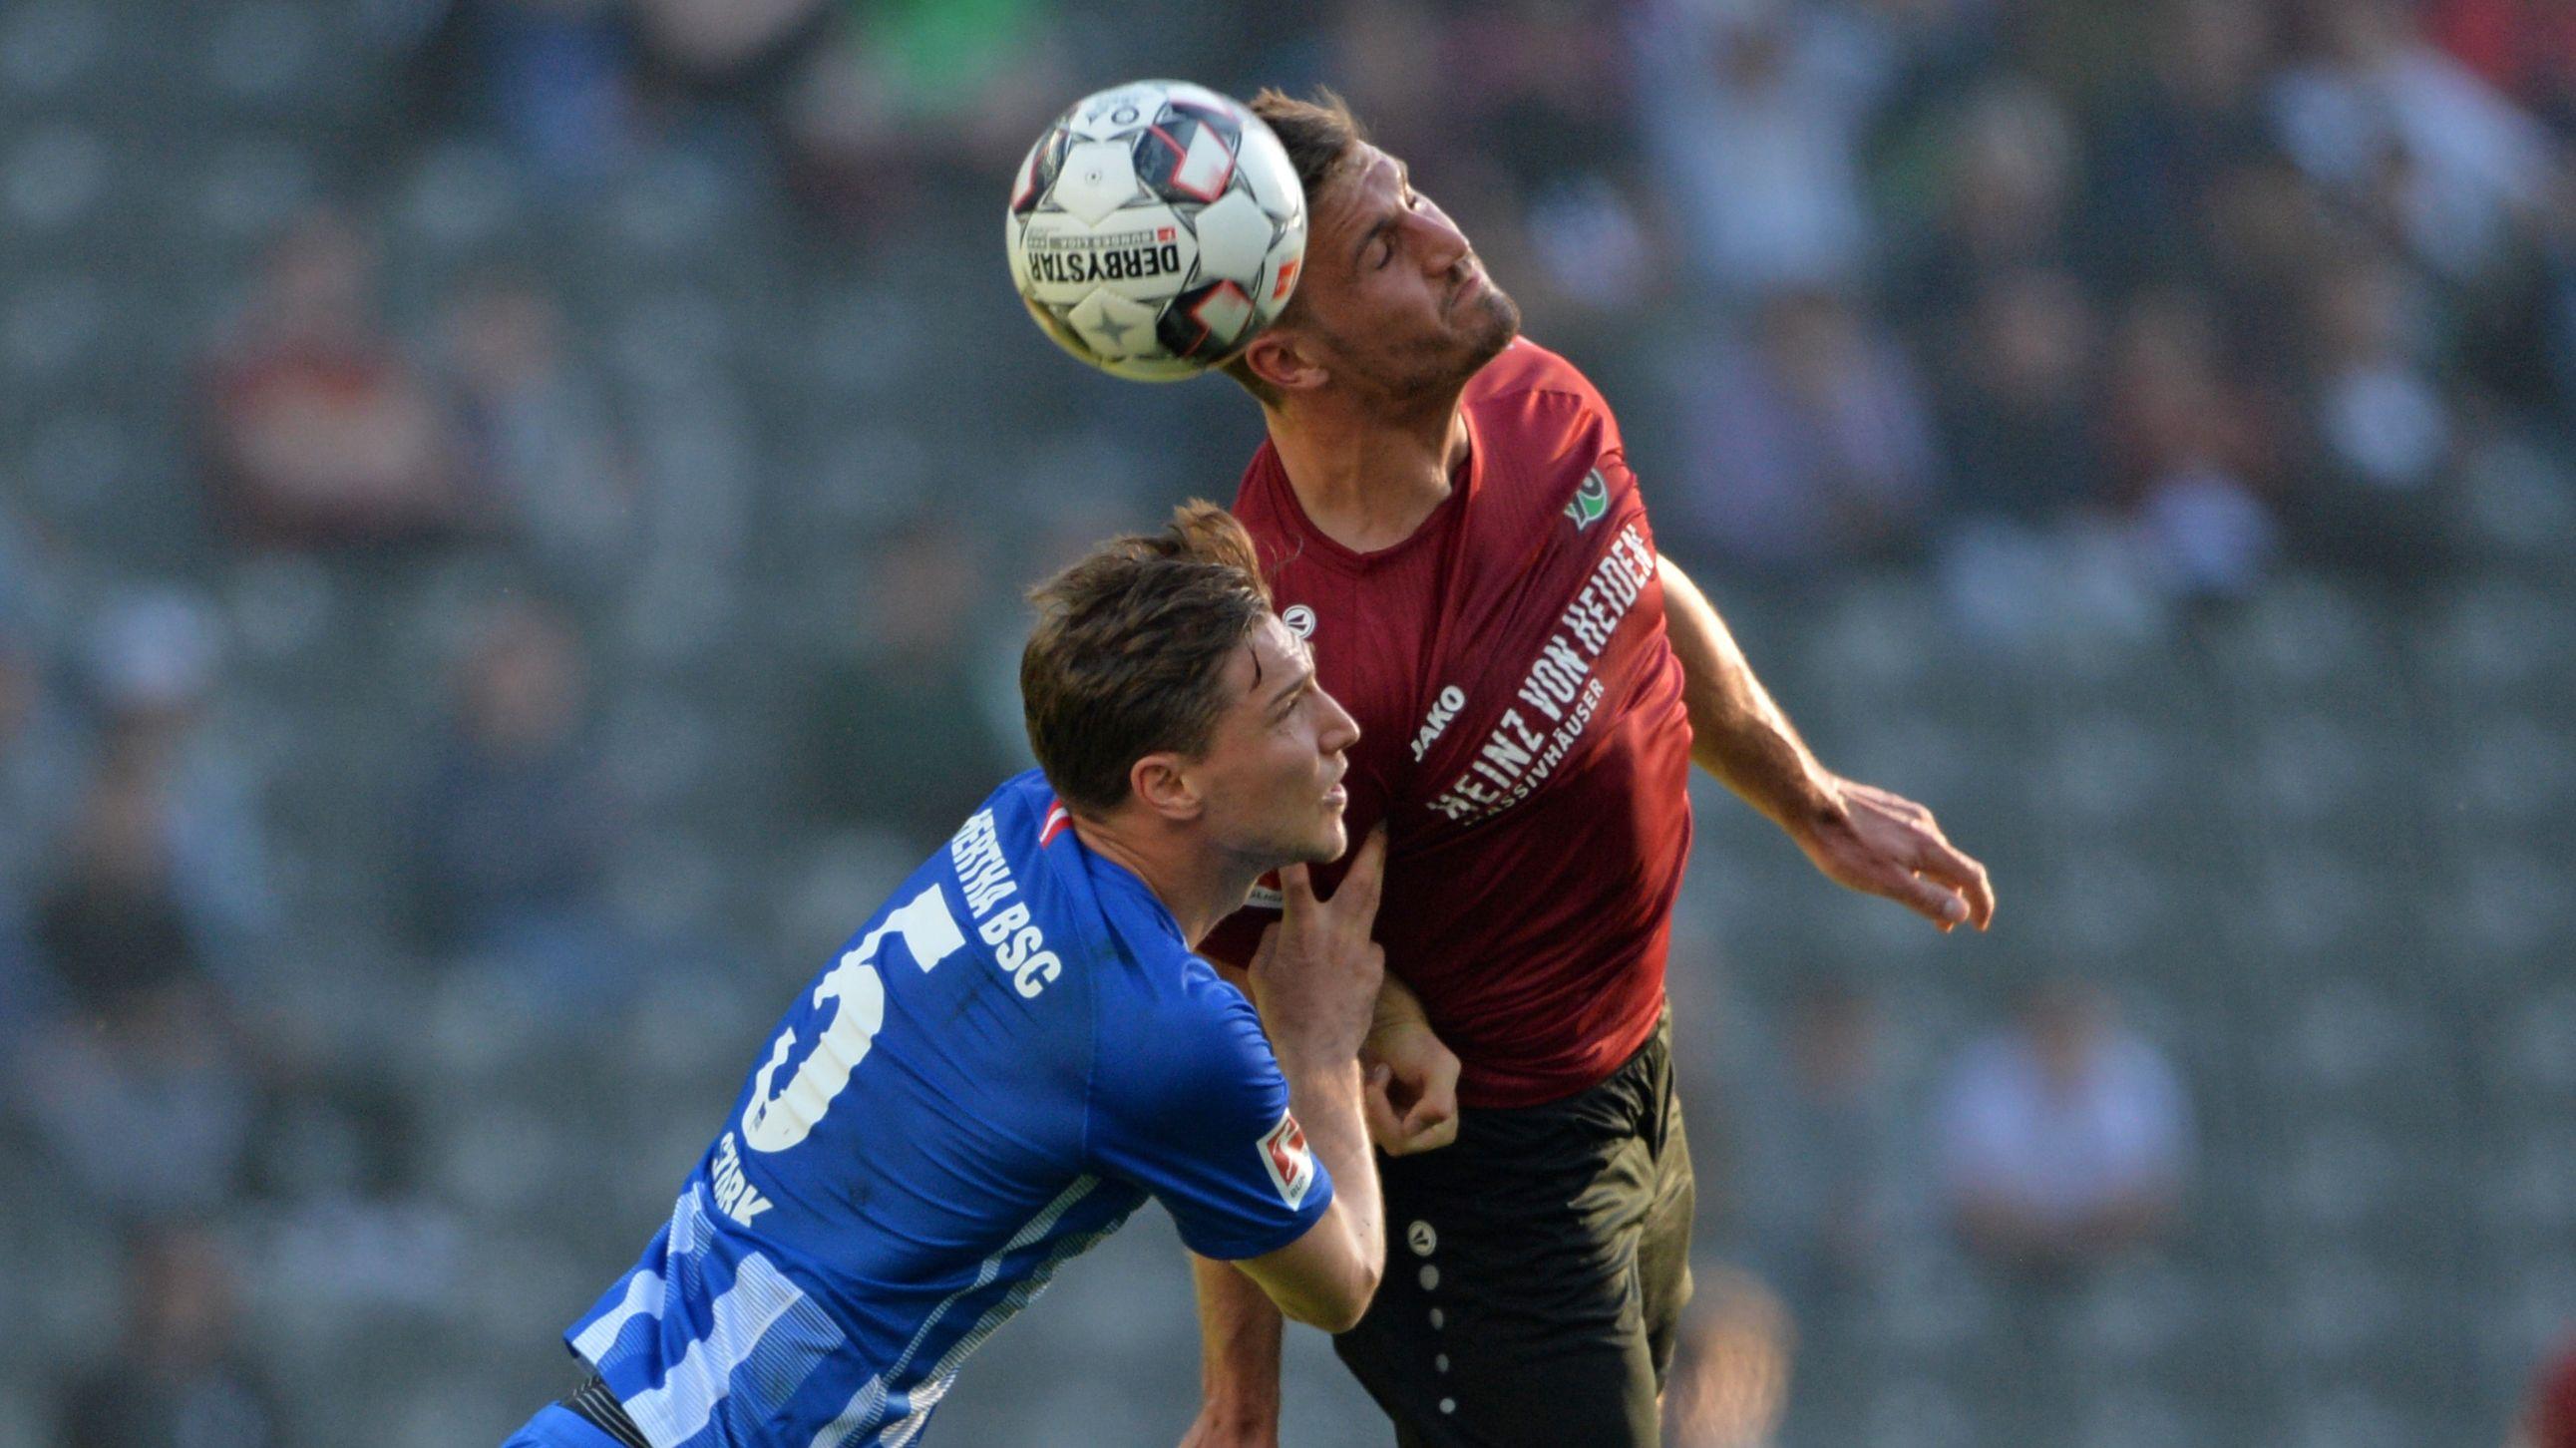 Kopfballduell in der 1. Bundesliga / Hertha BSC Berlin - Hannover 96